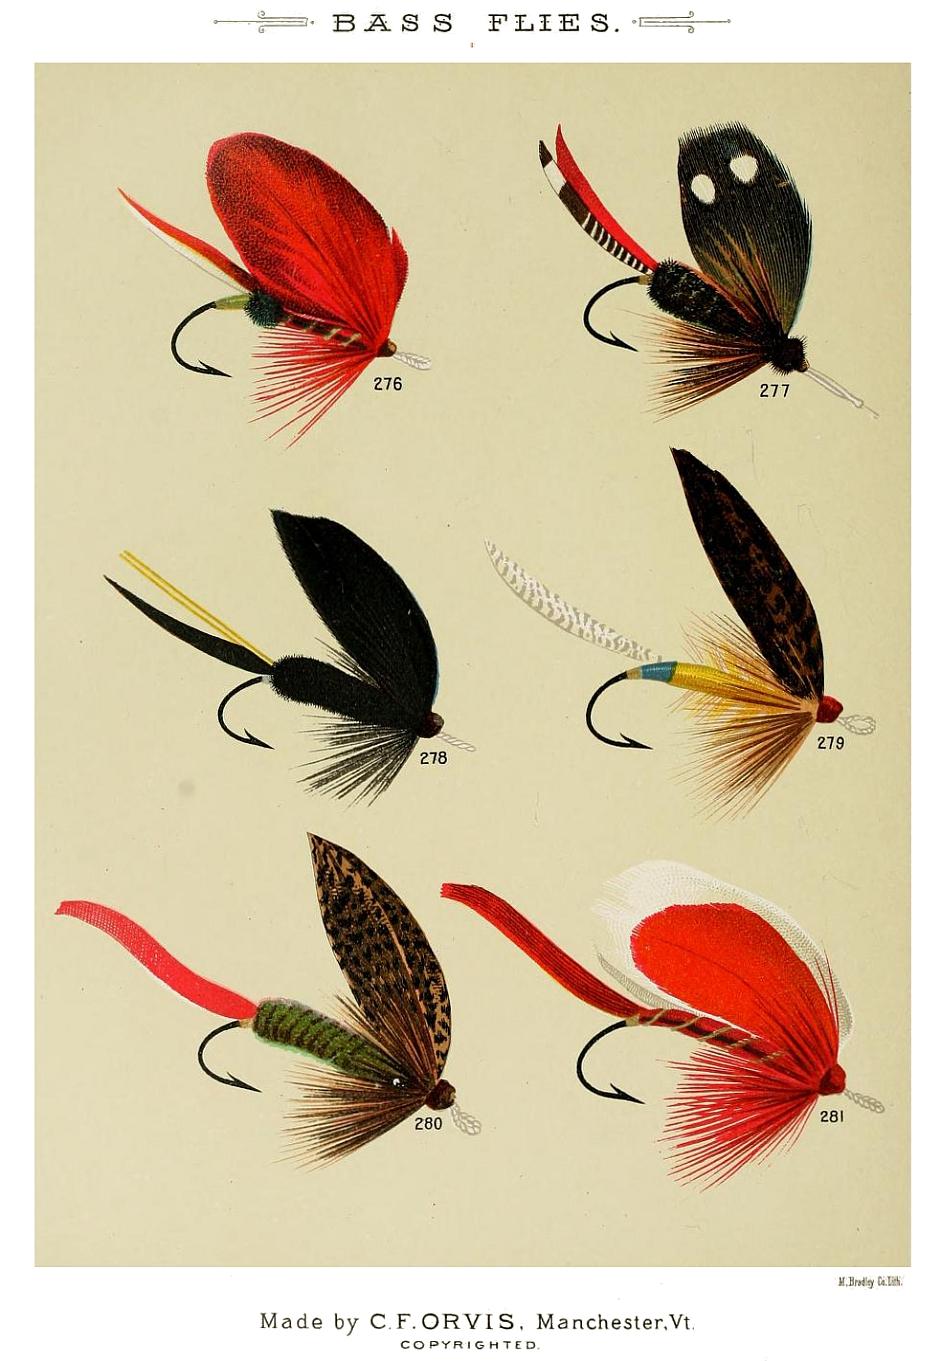 276. Scarlet Ibis – 277. Parker – 278. Raven – 279. Toodle-bug – 280. Read – 281. Premier